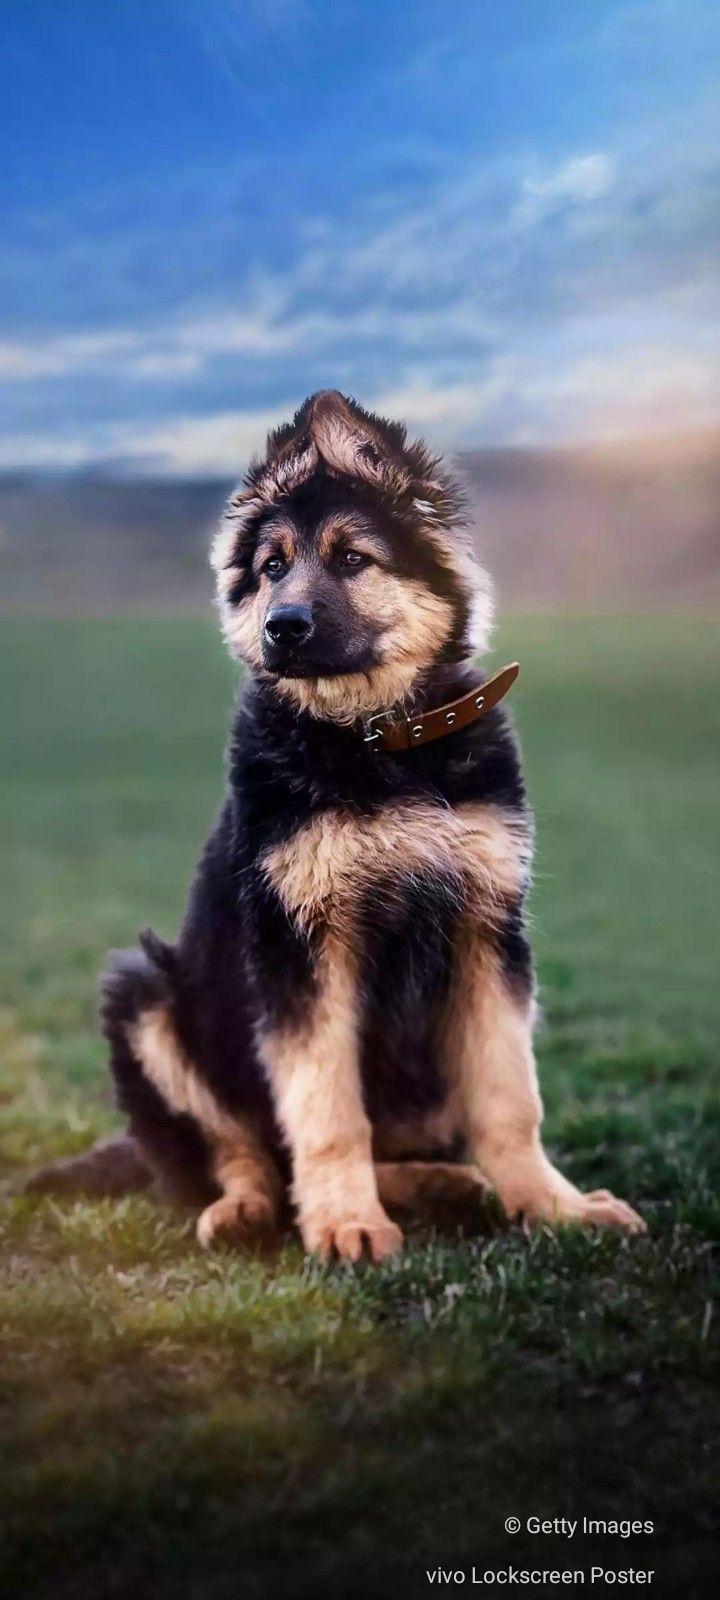 Pin by Durgashankar Jogi on durga in 2020 Forever puppy